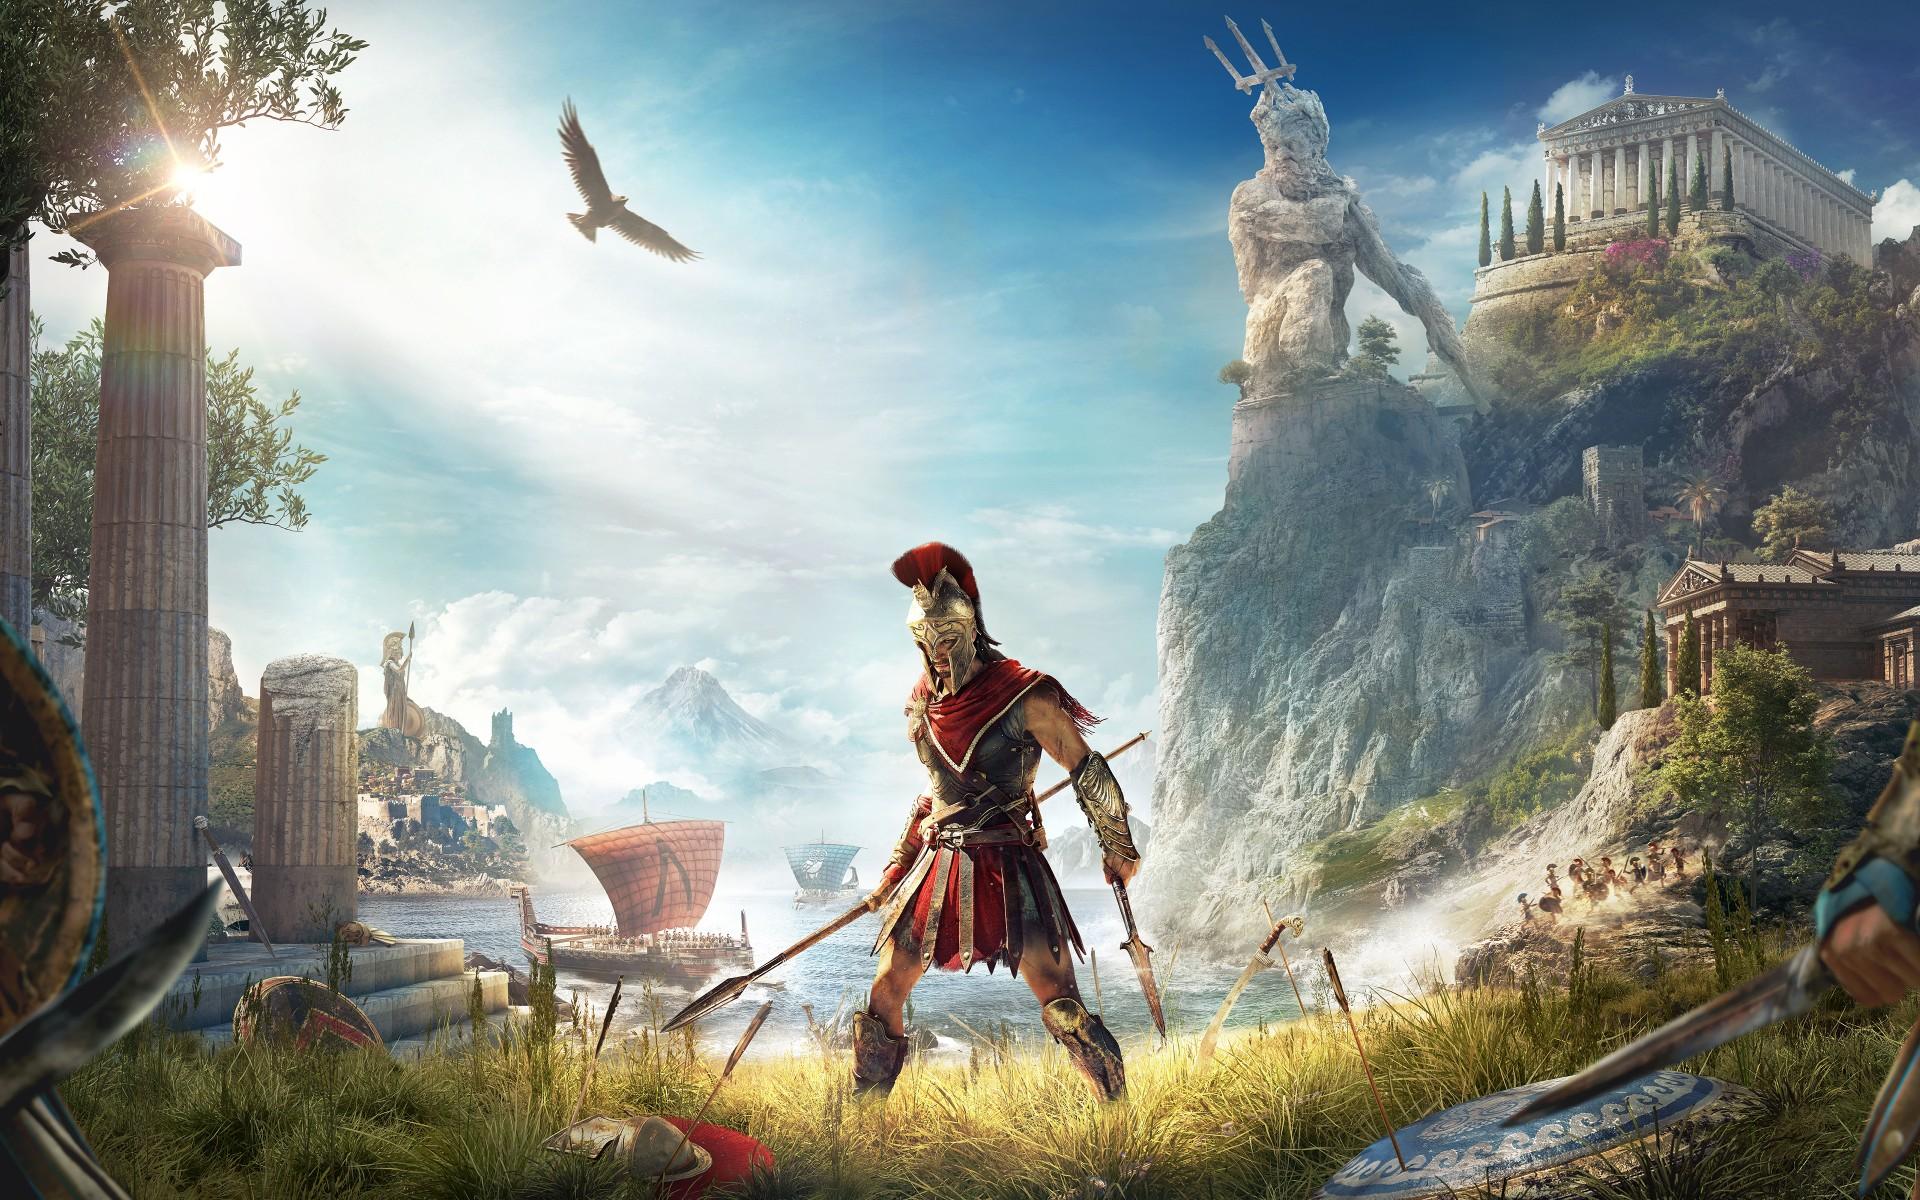 Windows Wallpaper Hd Assassin S Creed Odyssey 4k 8k Wallpapers Hd Wallpapers